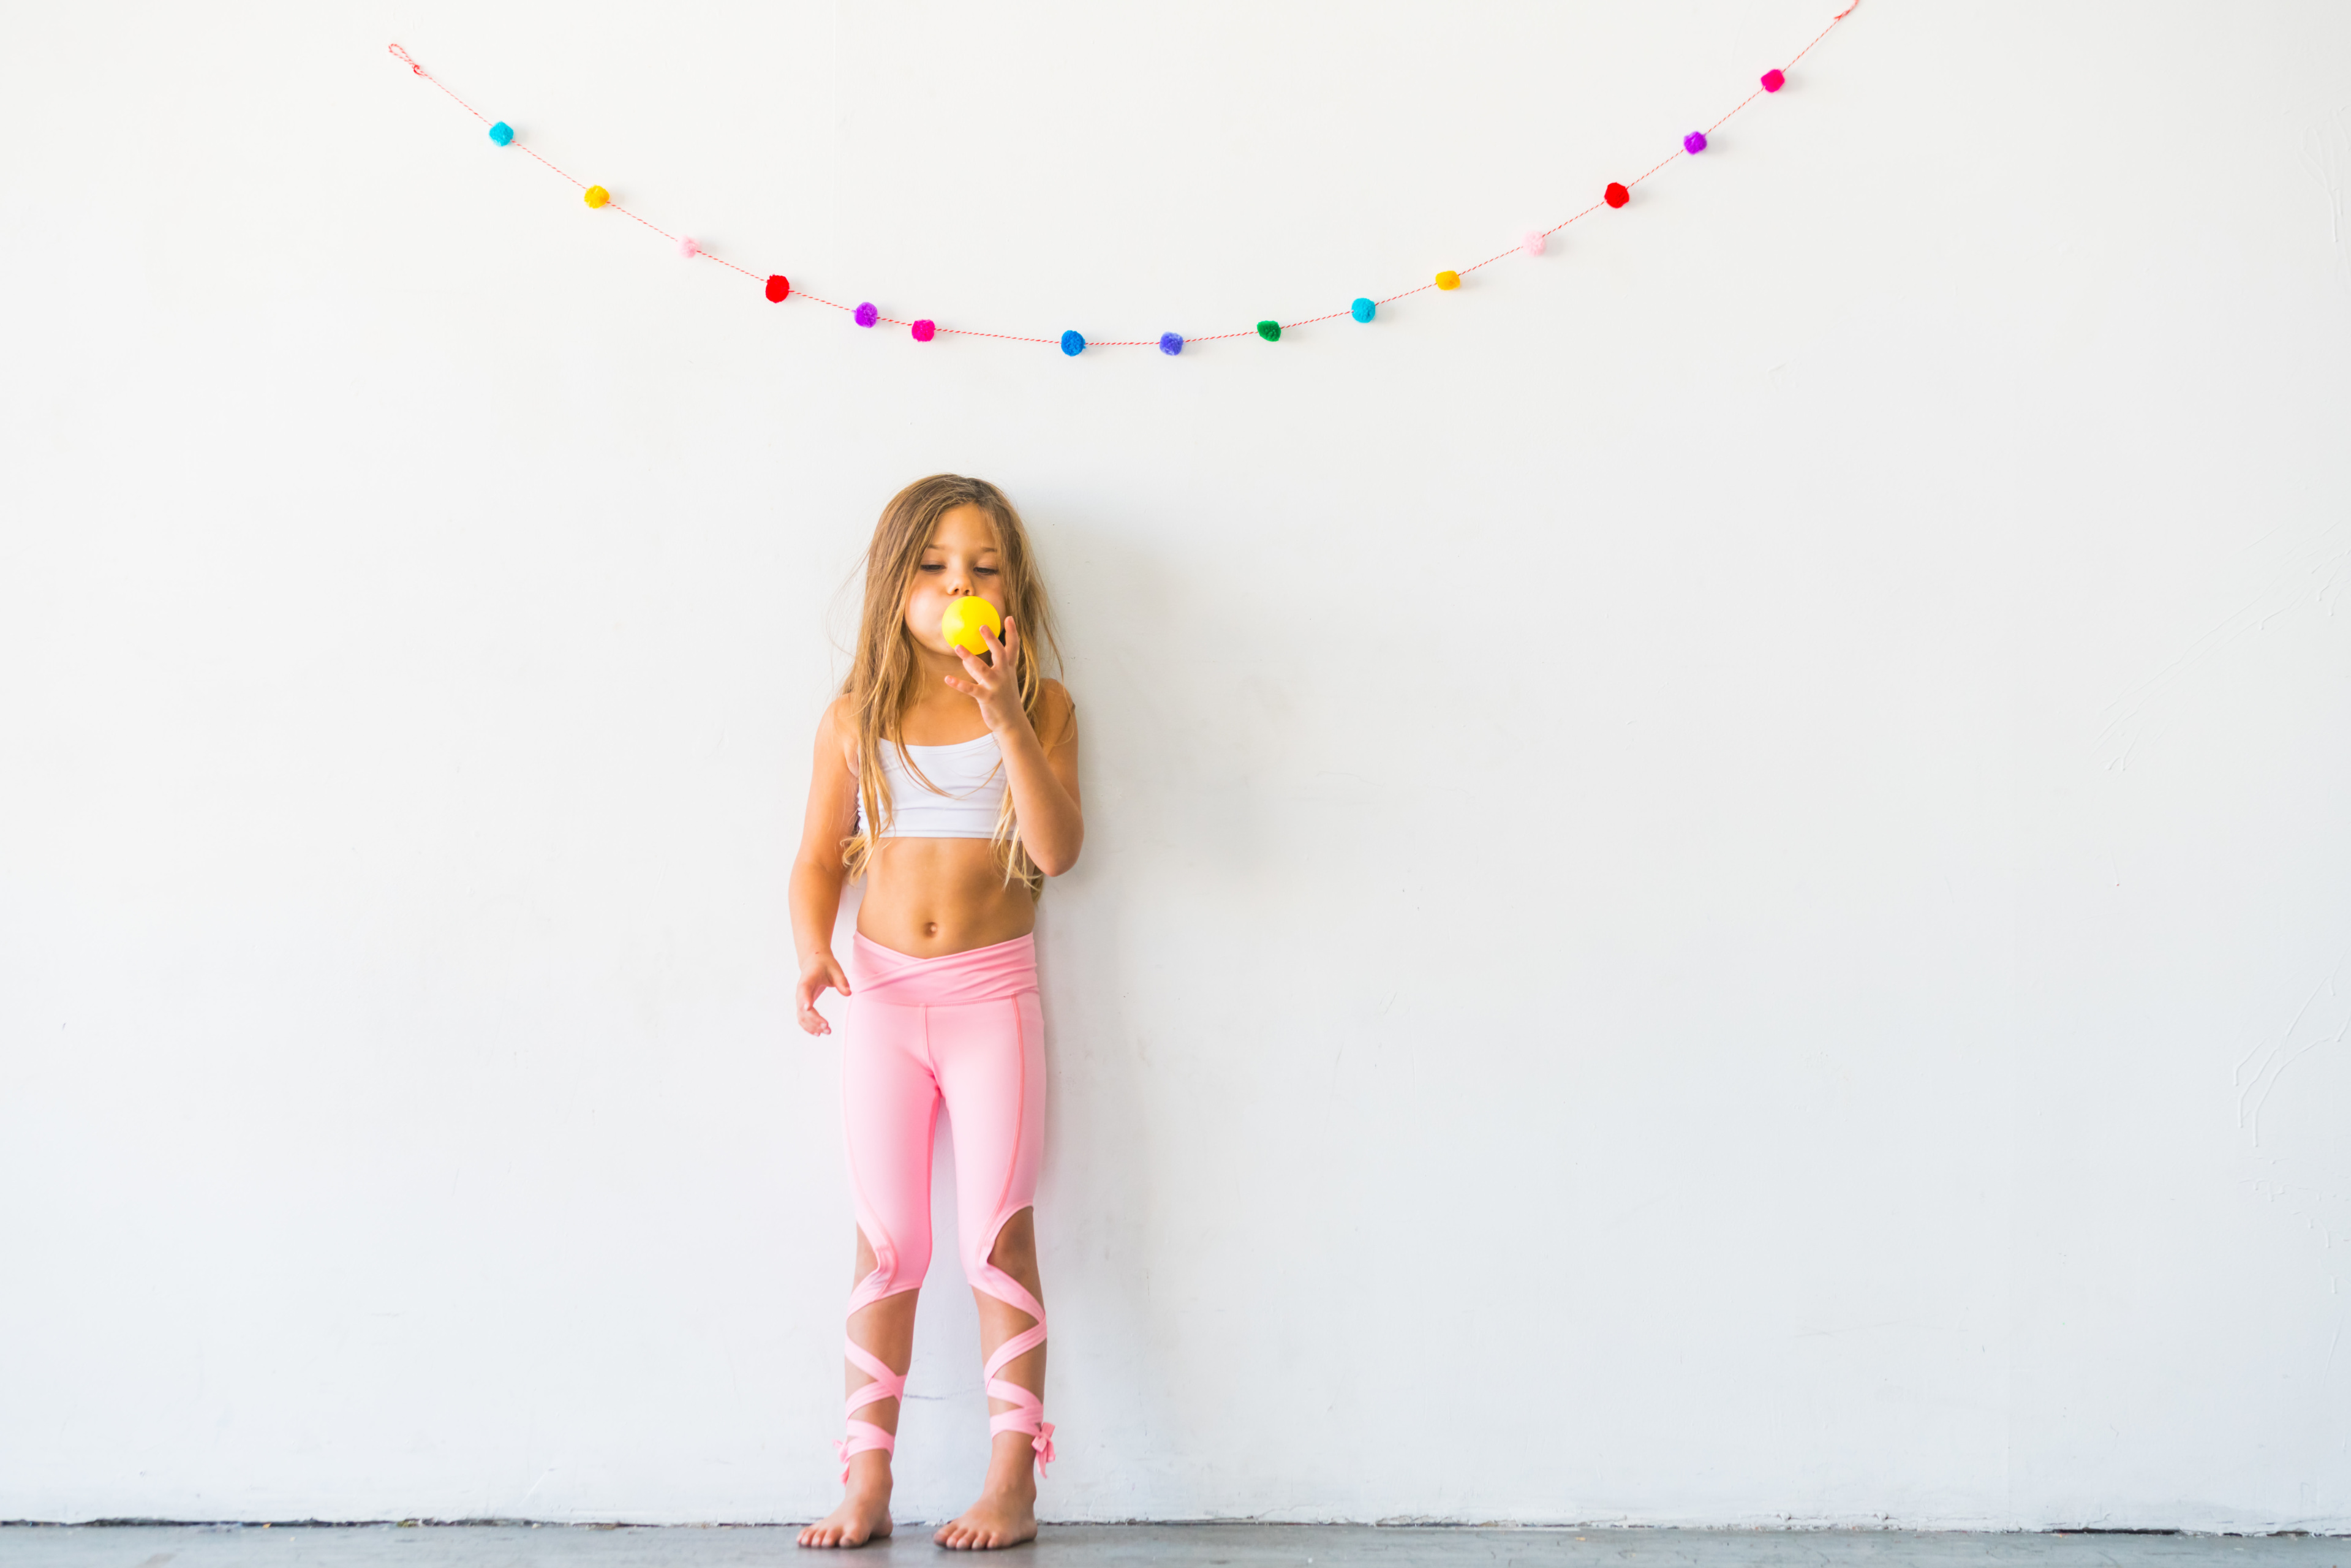 48b0273e2b8f5 Details about Flexi Lexi Fitness Kids Minis Coral Pink Dancer Leggings  Sports Yoga Pants